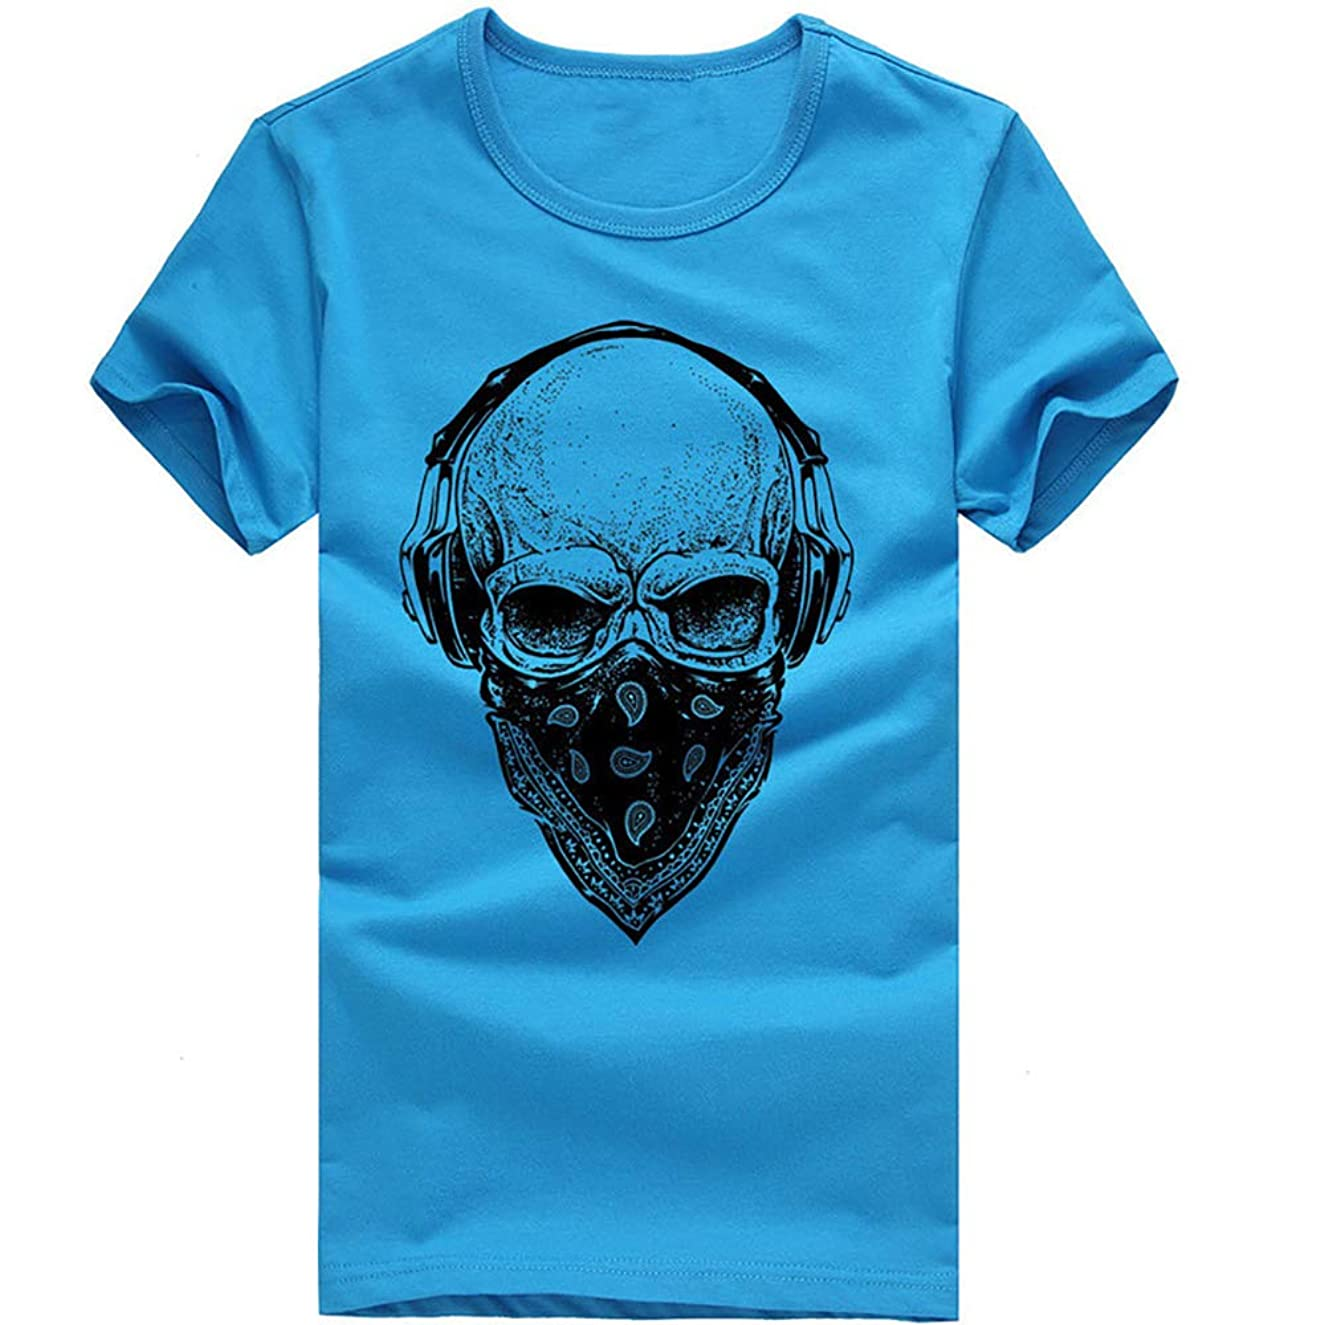 Men Fashion Short Sleeve Skull Printing Summer Casual Soft Cotton T Shirt Tees Tops